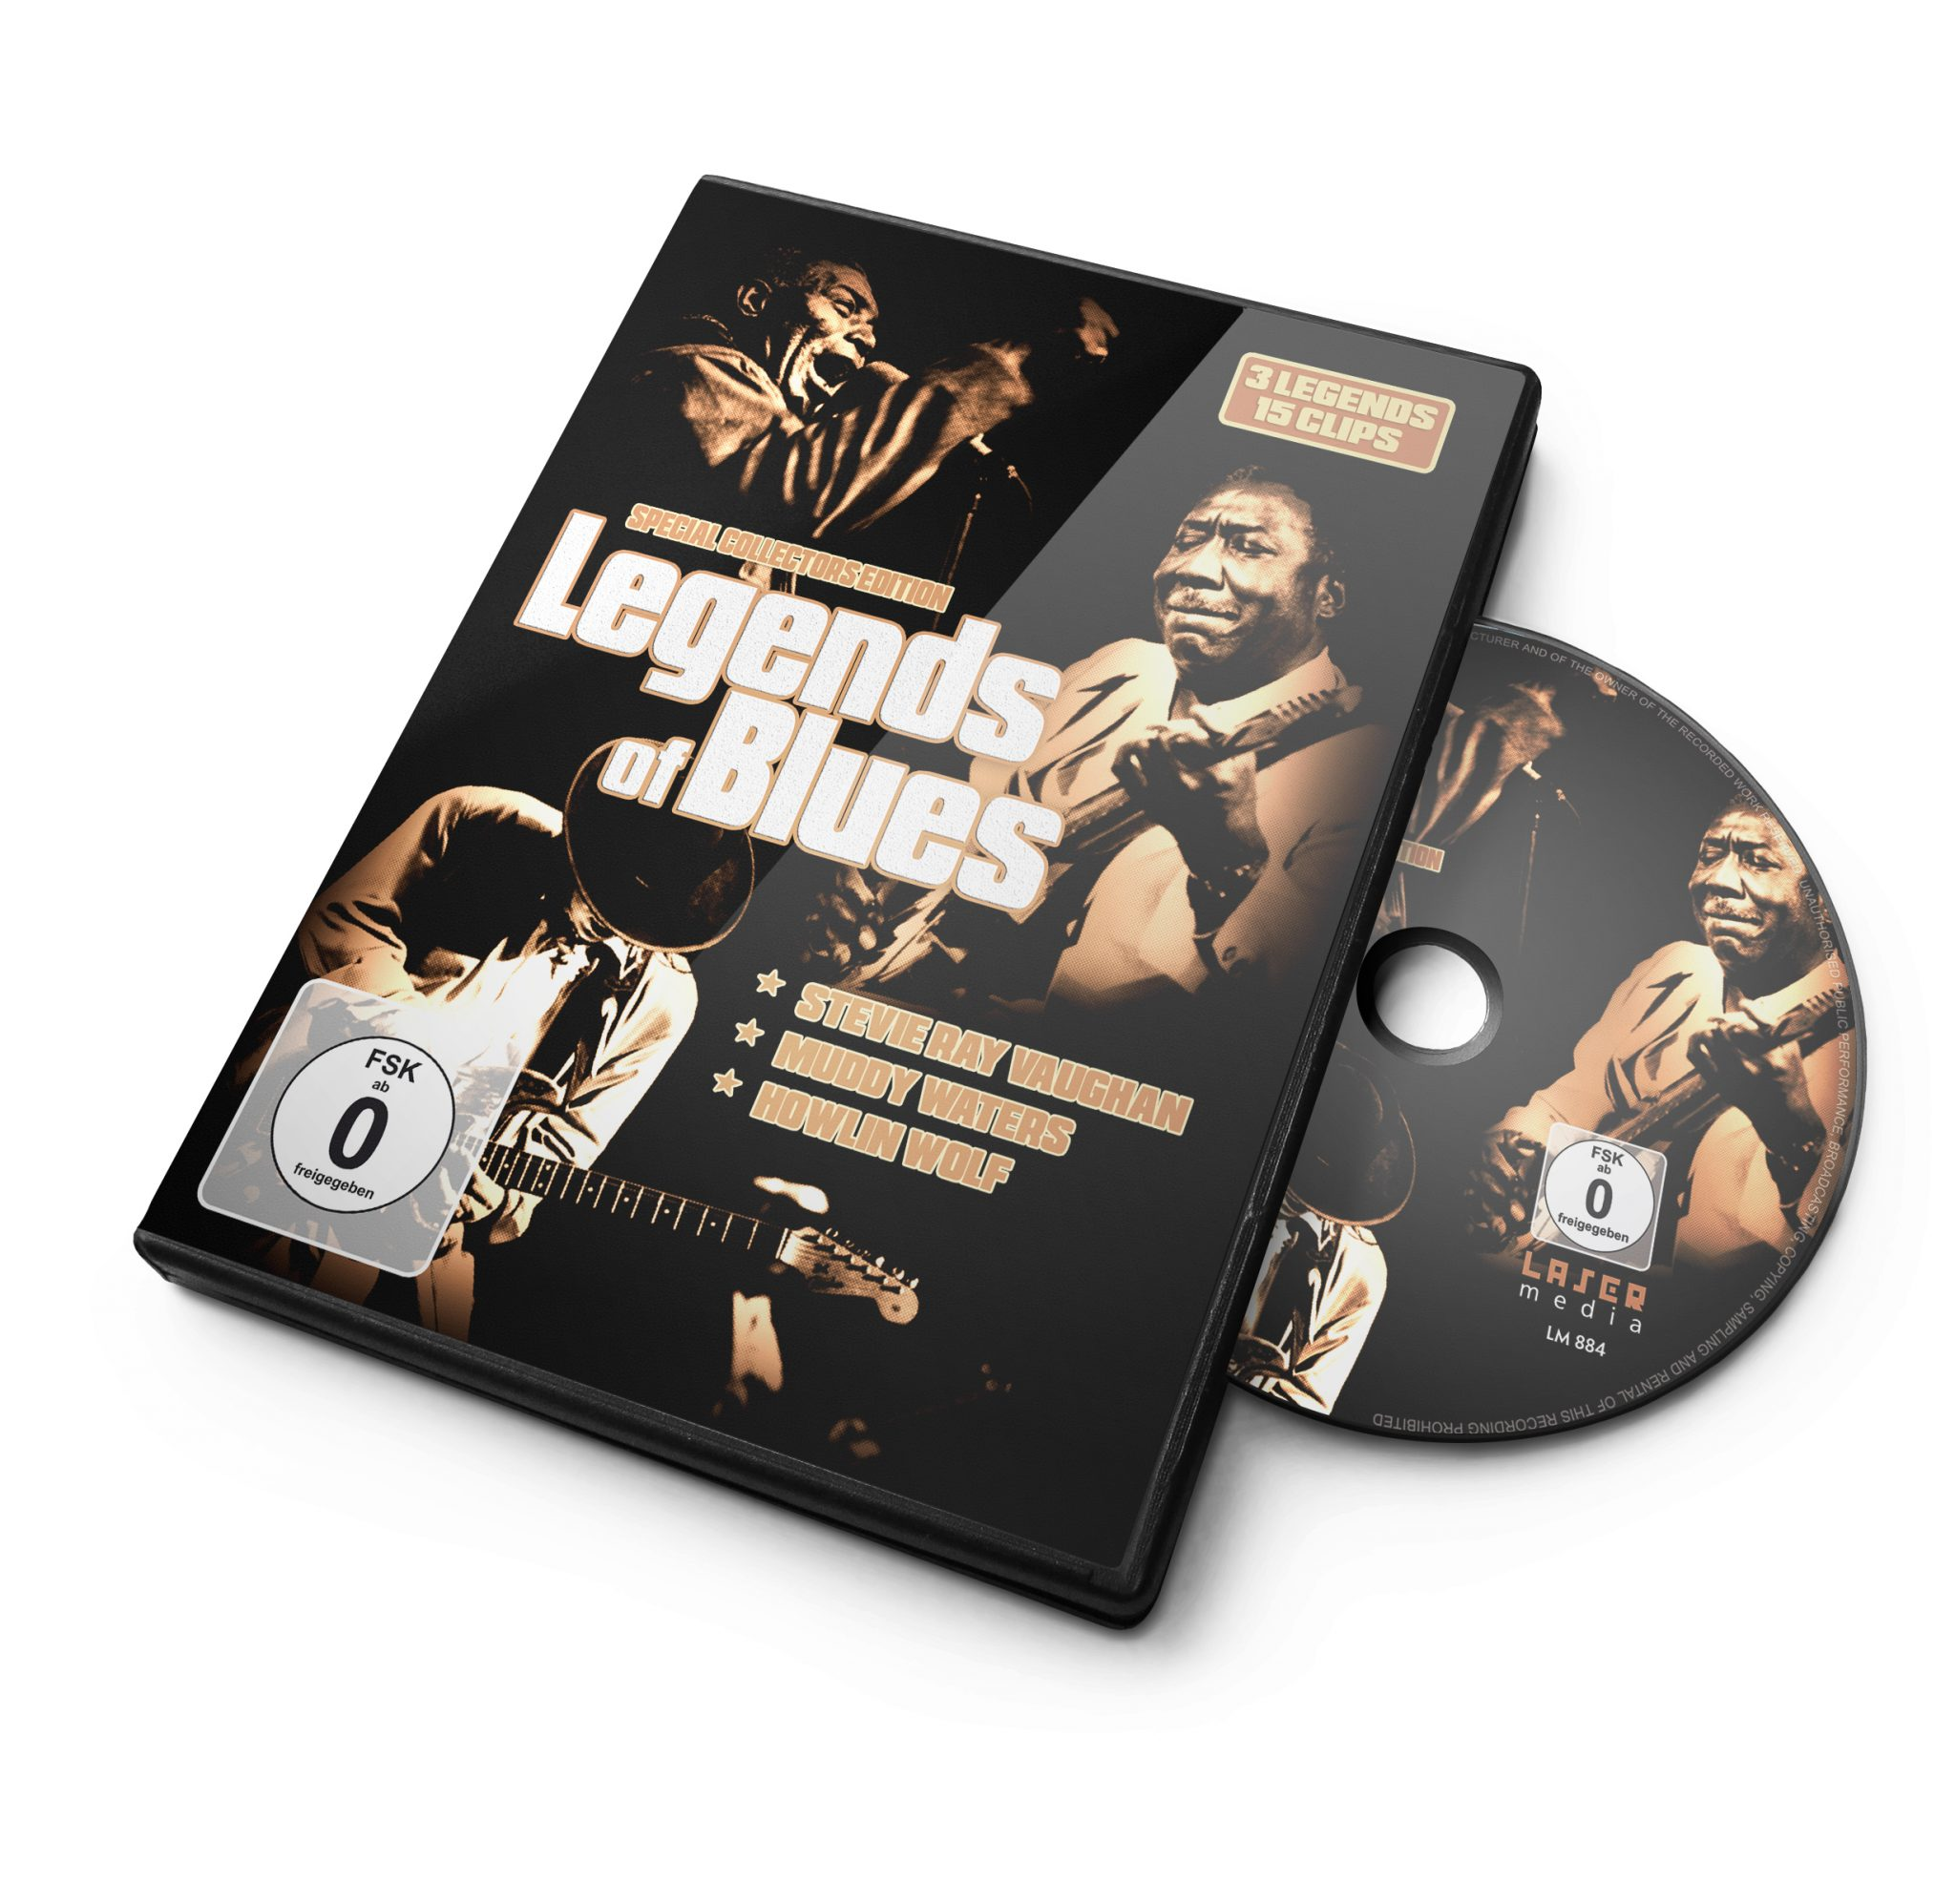 legends of blues_dvd